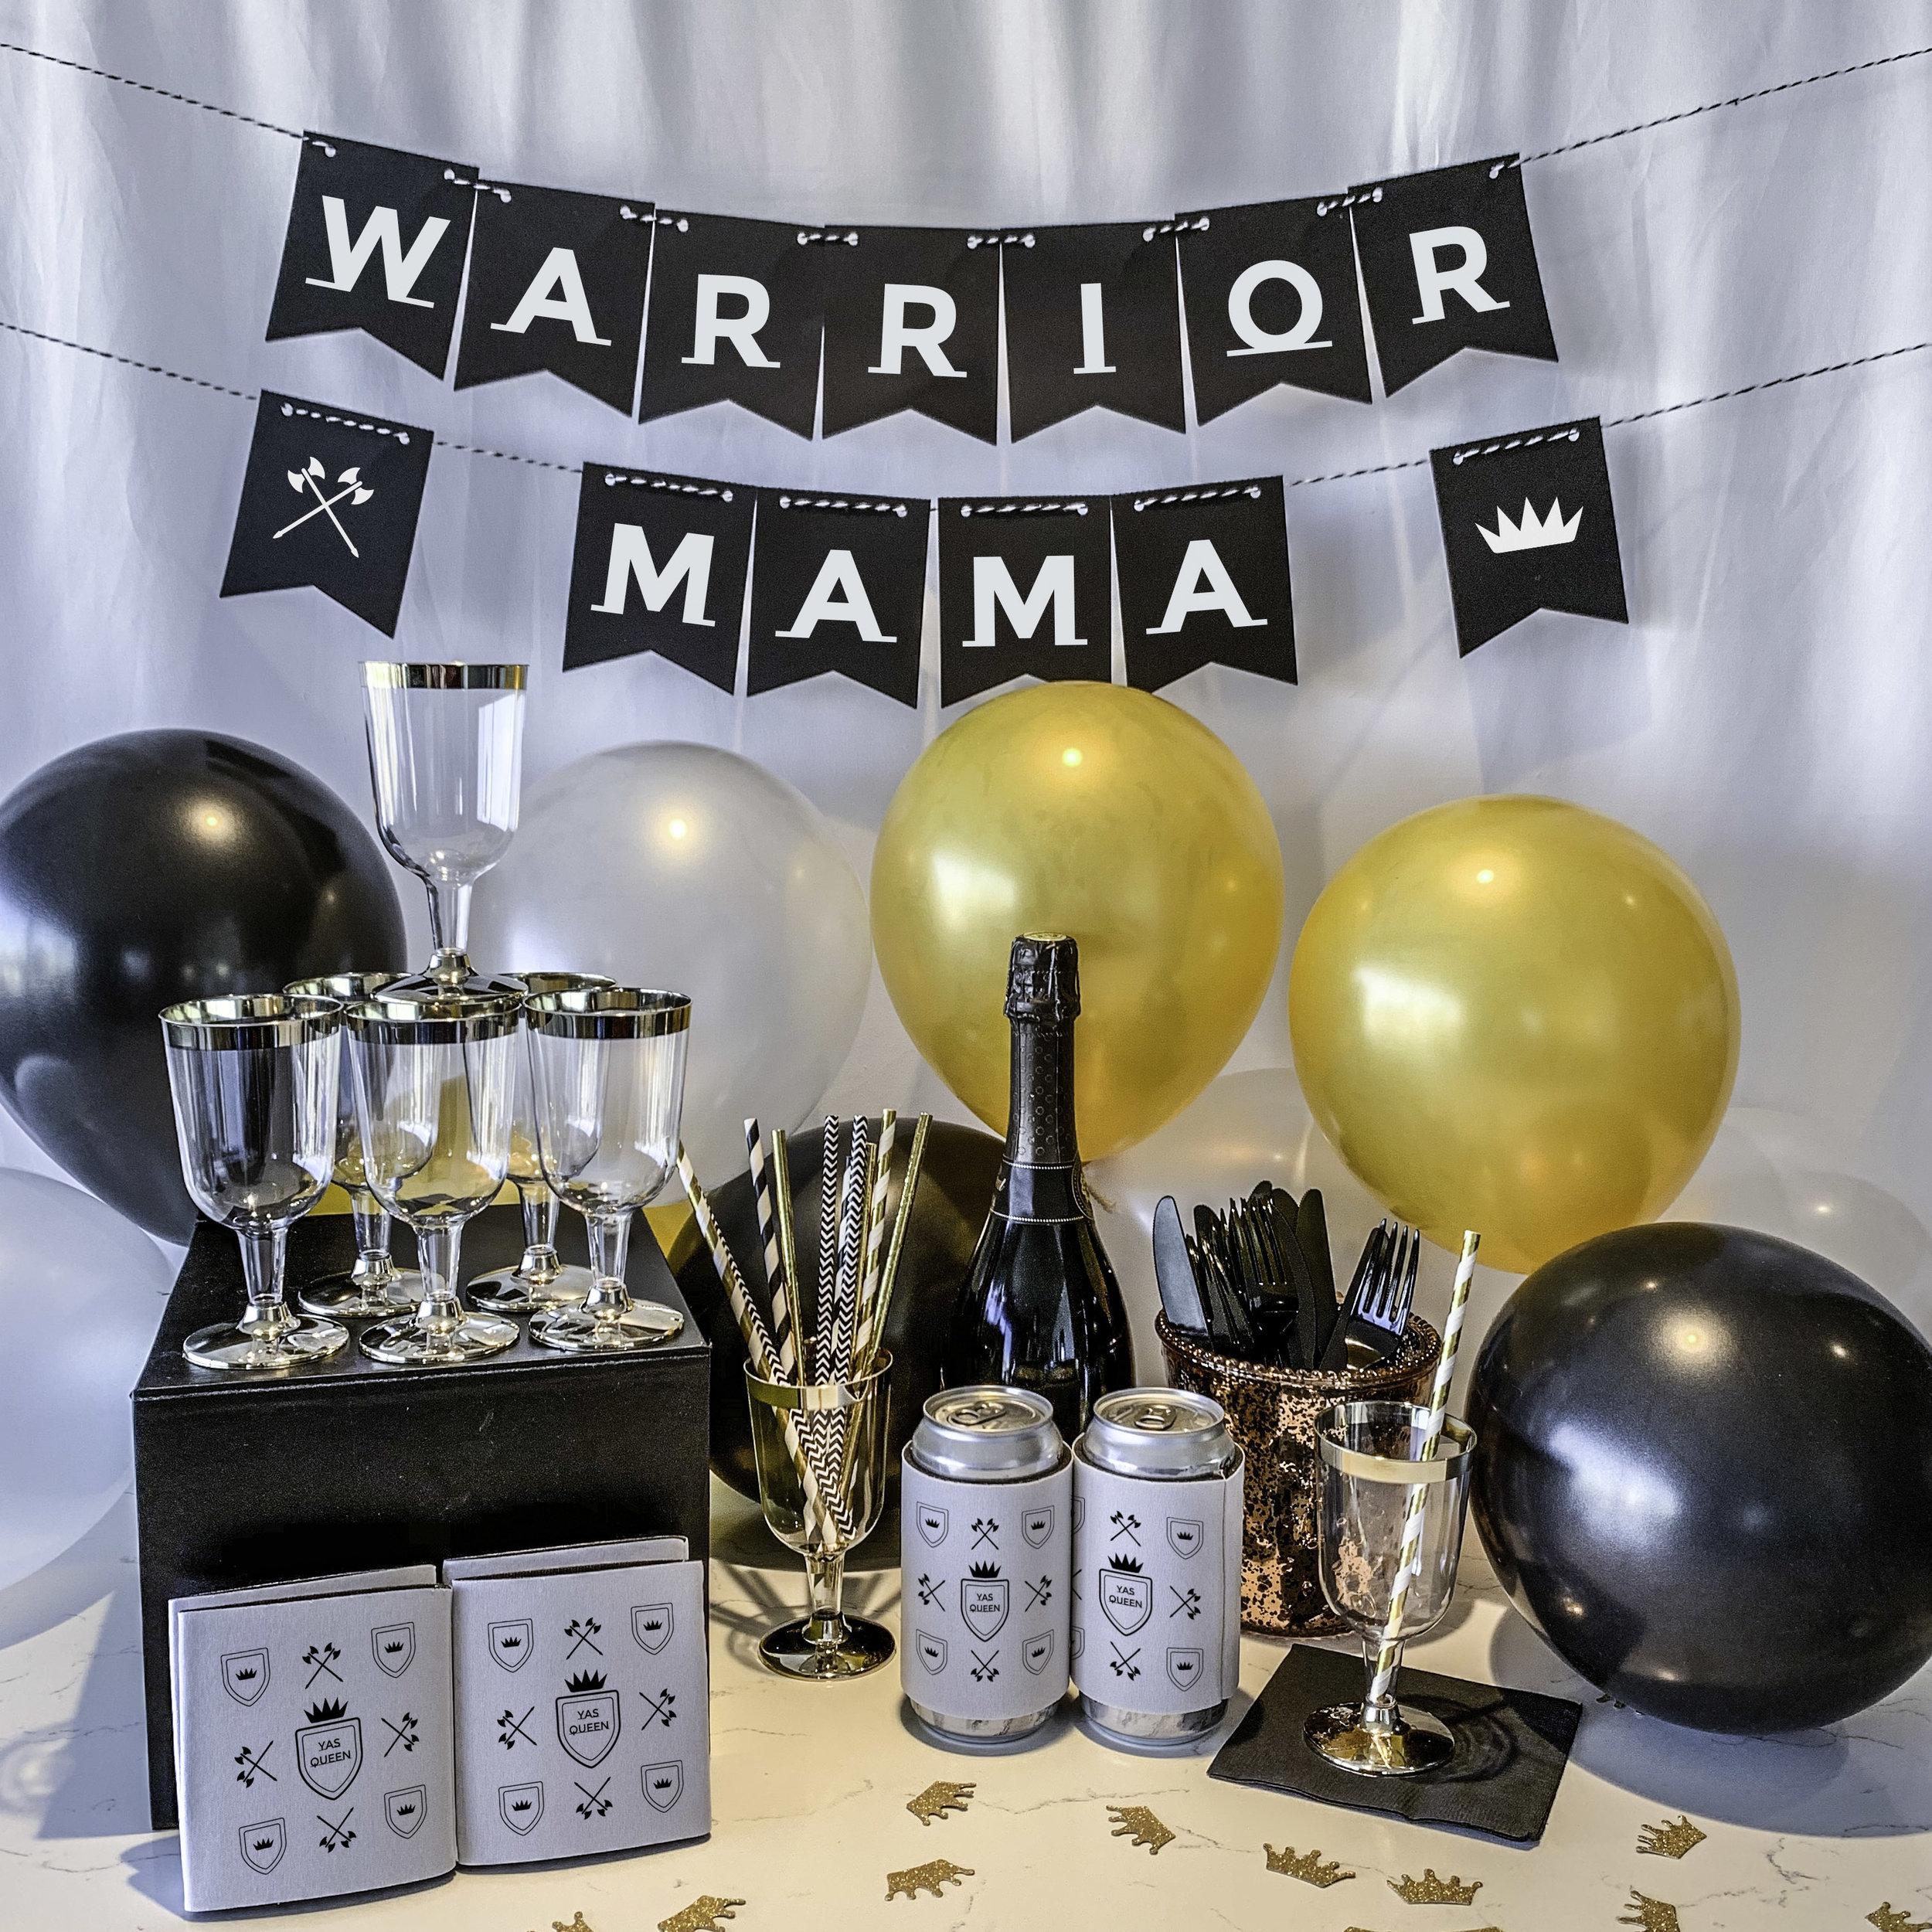 Warrior Baby - Starting at $49.00+